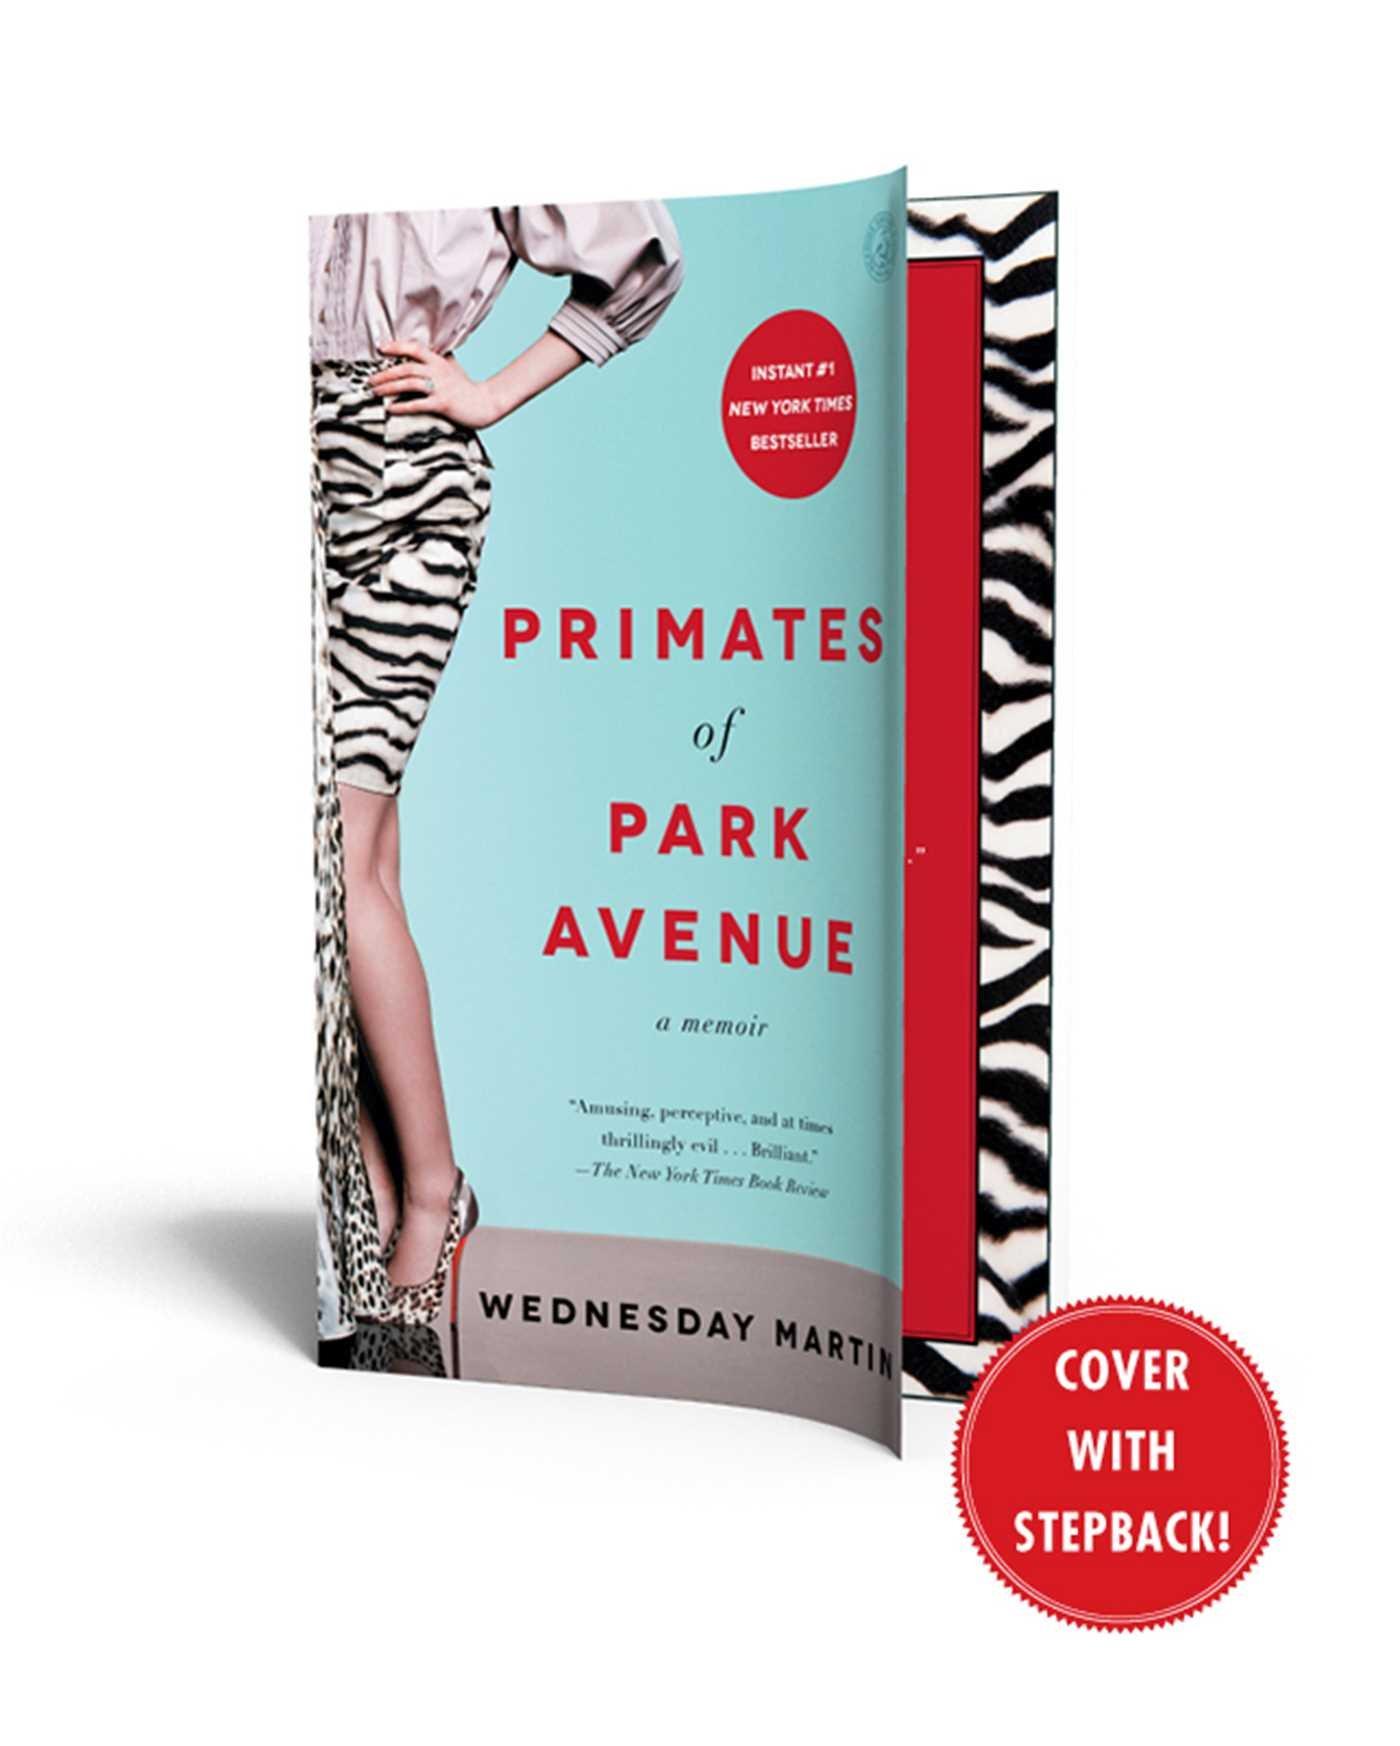 Primates of Park Avenue: A Memoir: Amazon.es: Wednesday Martin: Libros en idiomas extranjeros